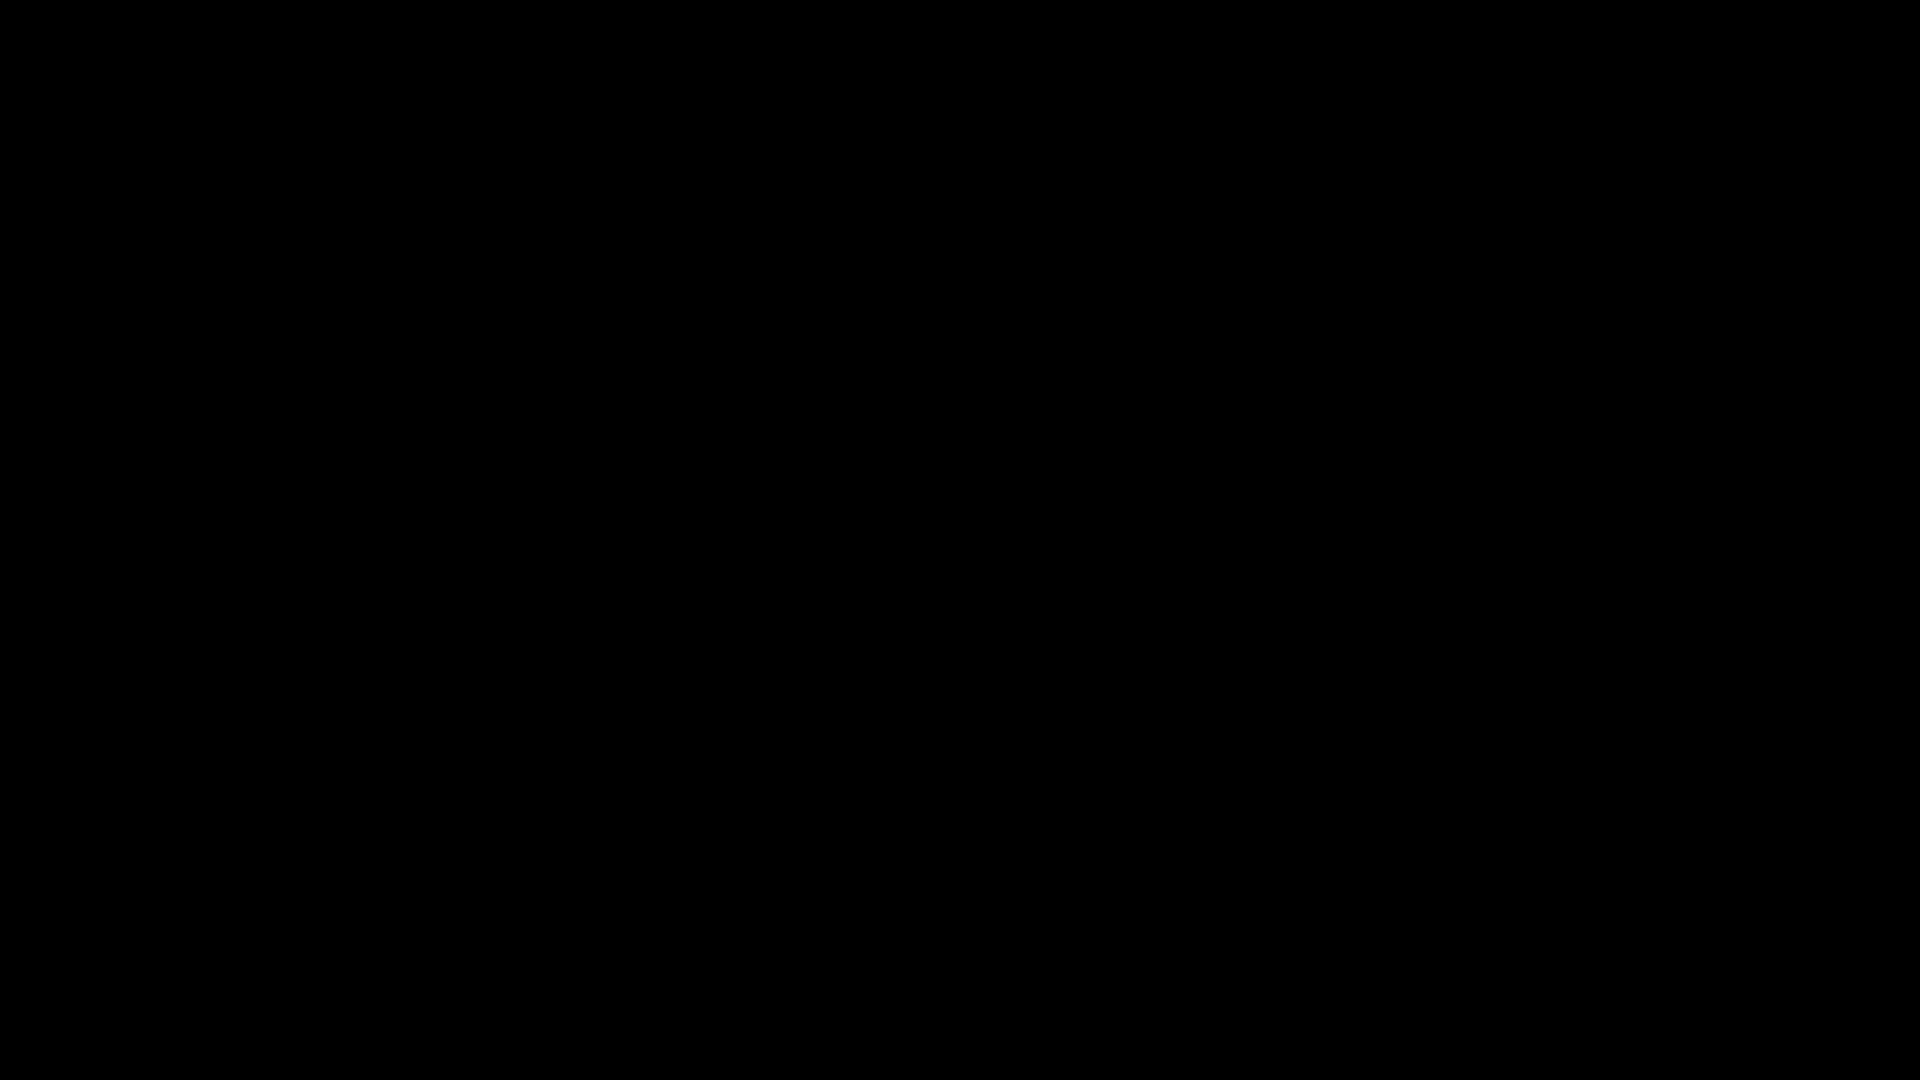 Bagaimana menambahkan Tulisan di Video Tiktok?